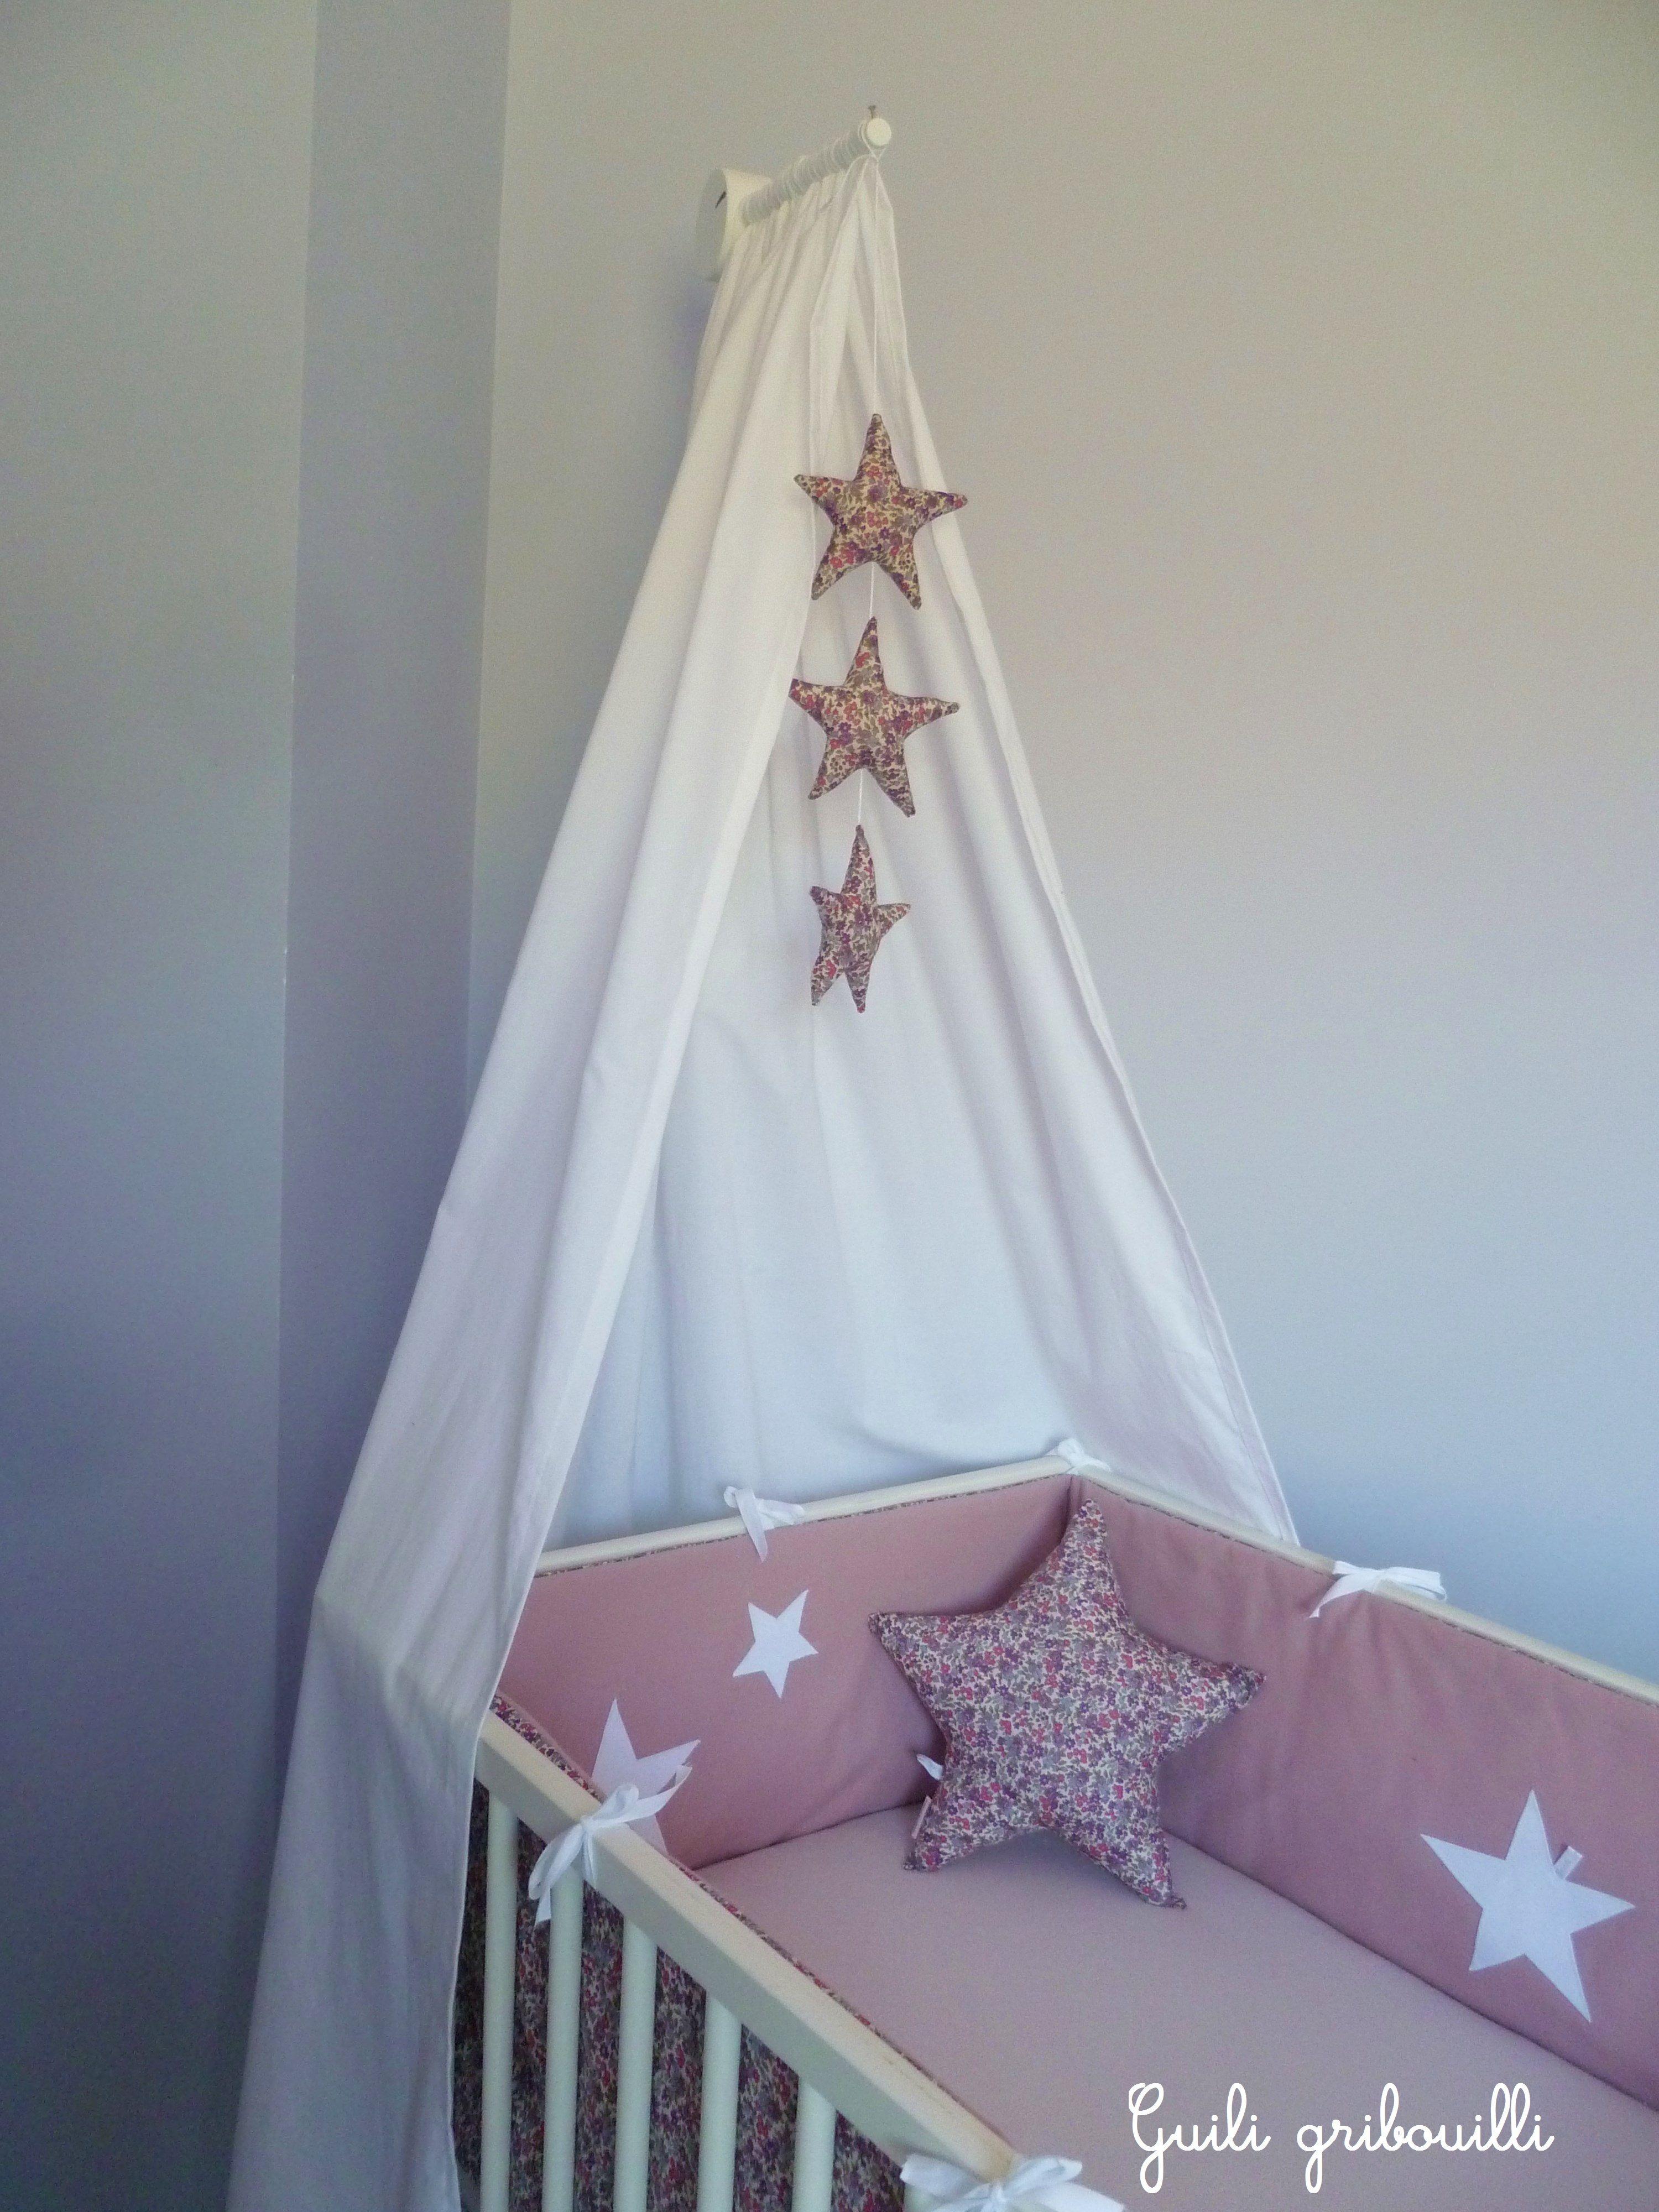 tour de lit liberty guili gribouilli mon bebe pinterest babies nursery and room. Black Bedroom Furniture Sets. Home Design Ideas